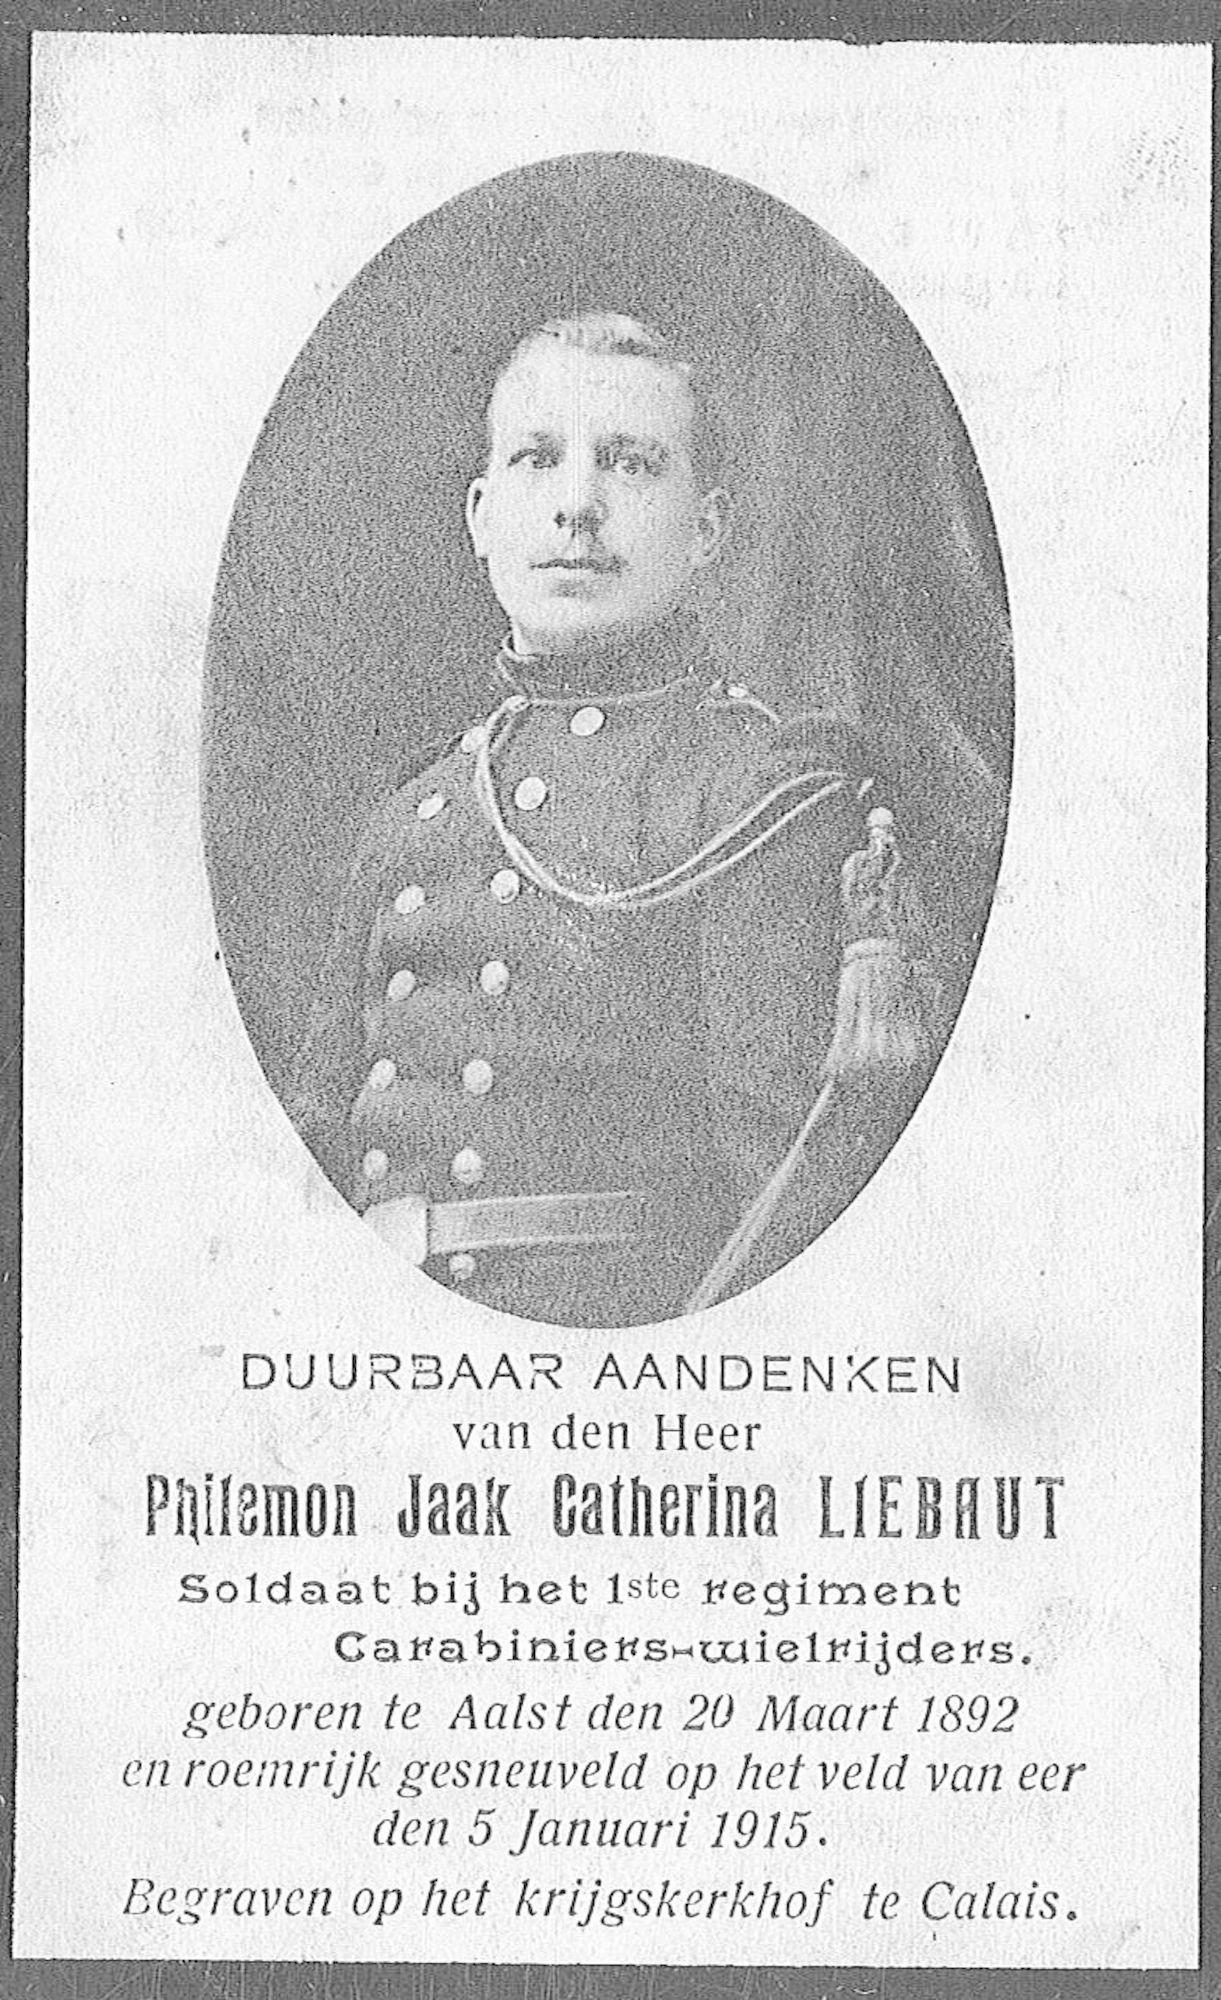 Philemon Jaak Catherina Liebaut